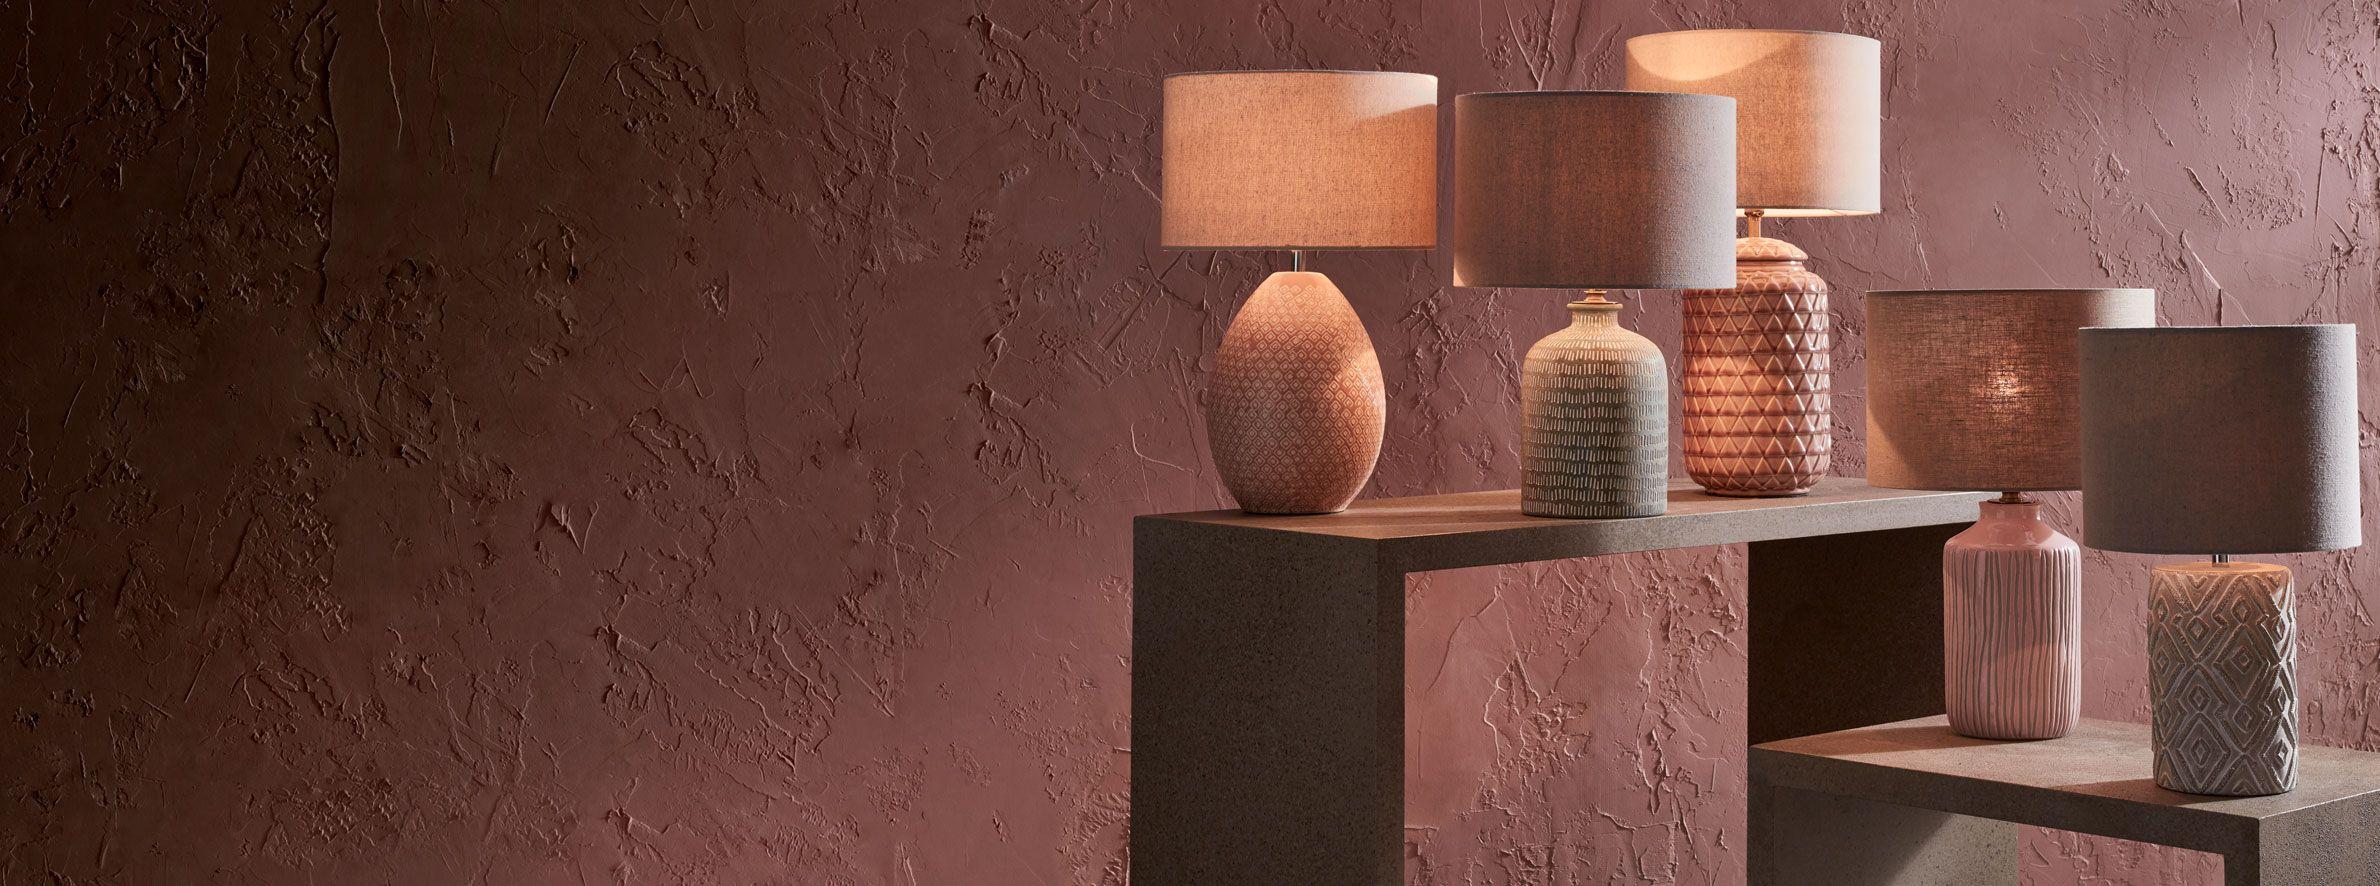 Desk Table Lamps